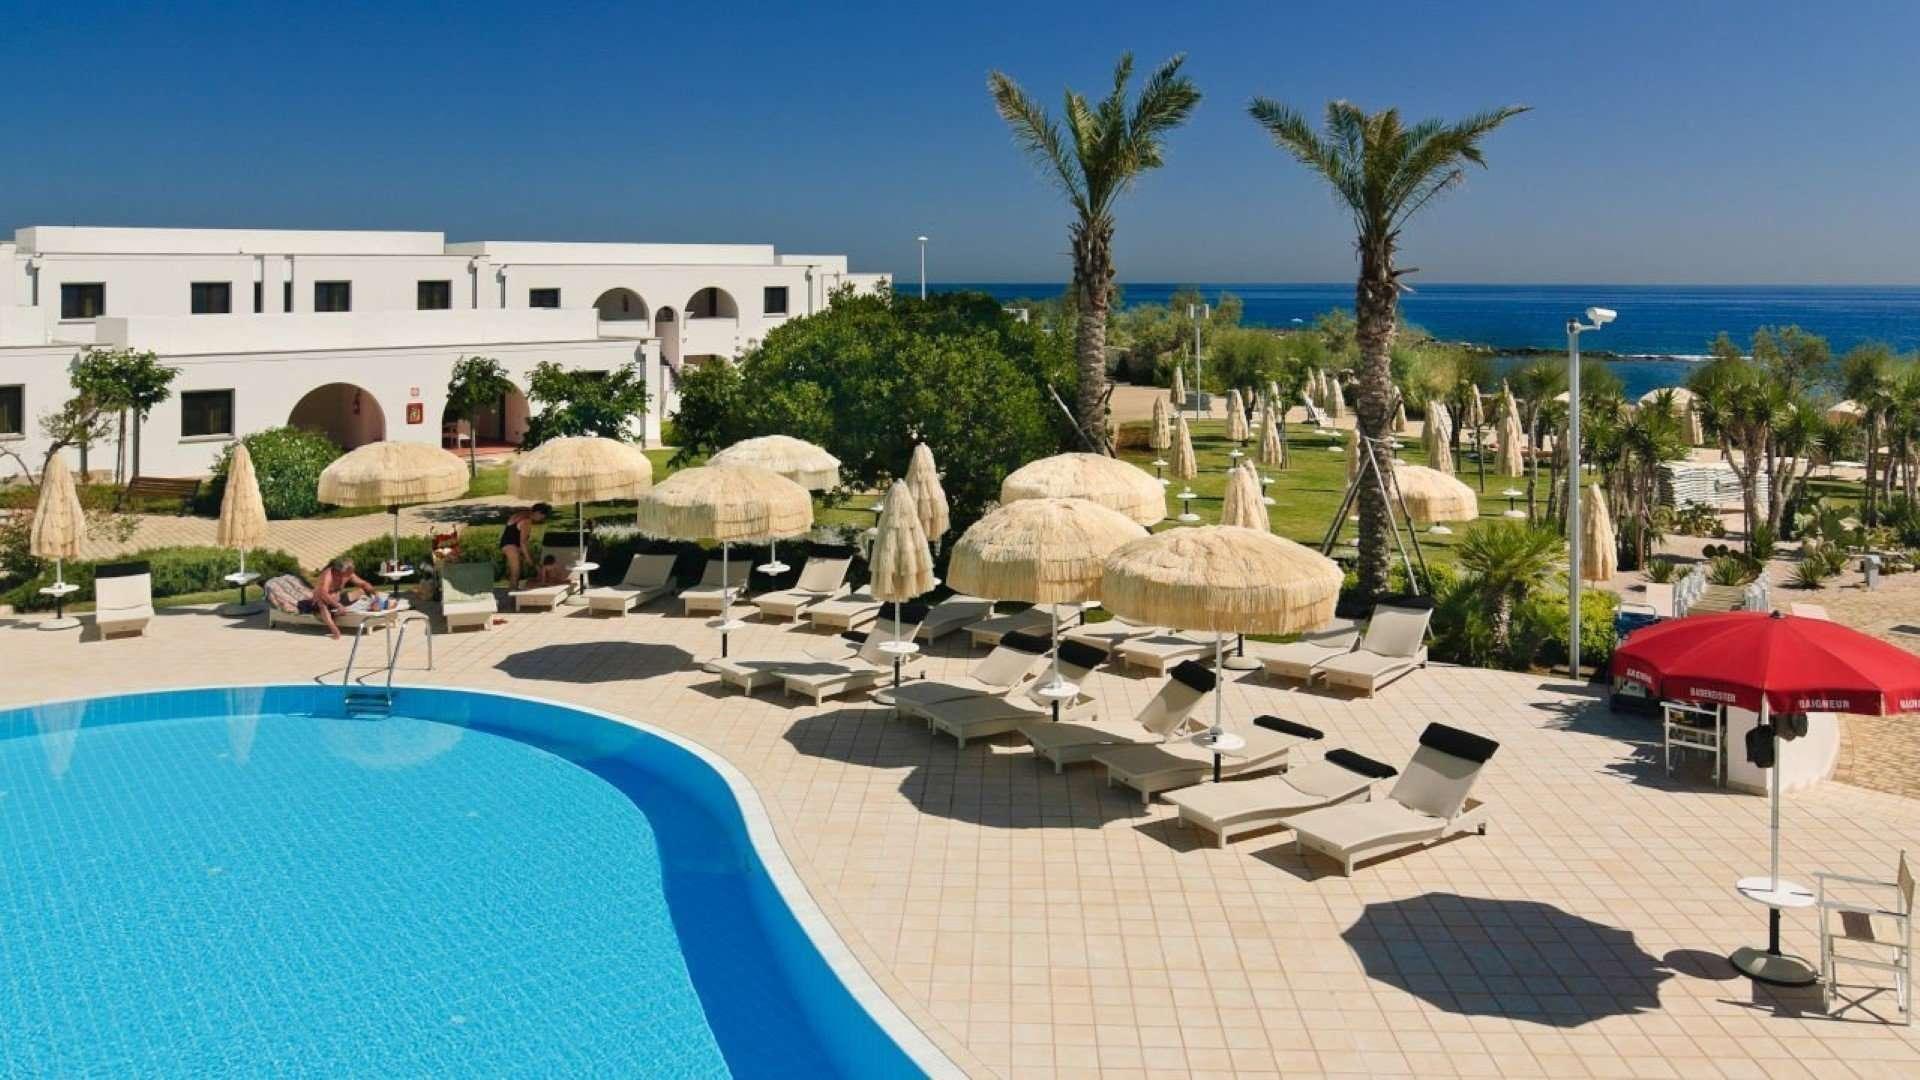 pietrablu resort & spa - puglia - italie - overview